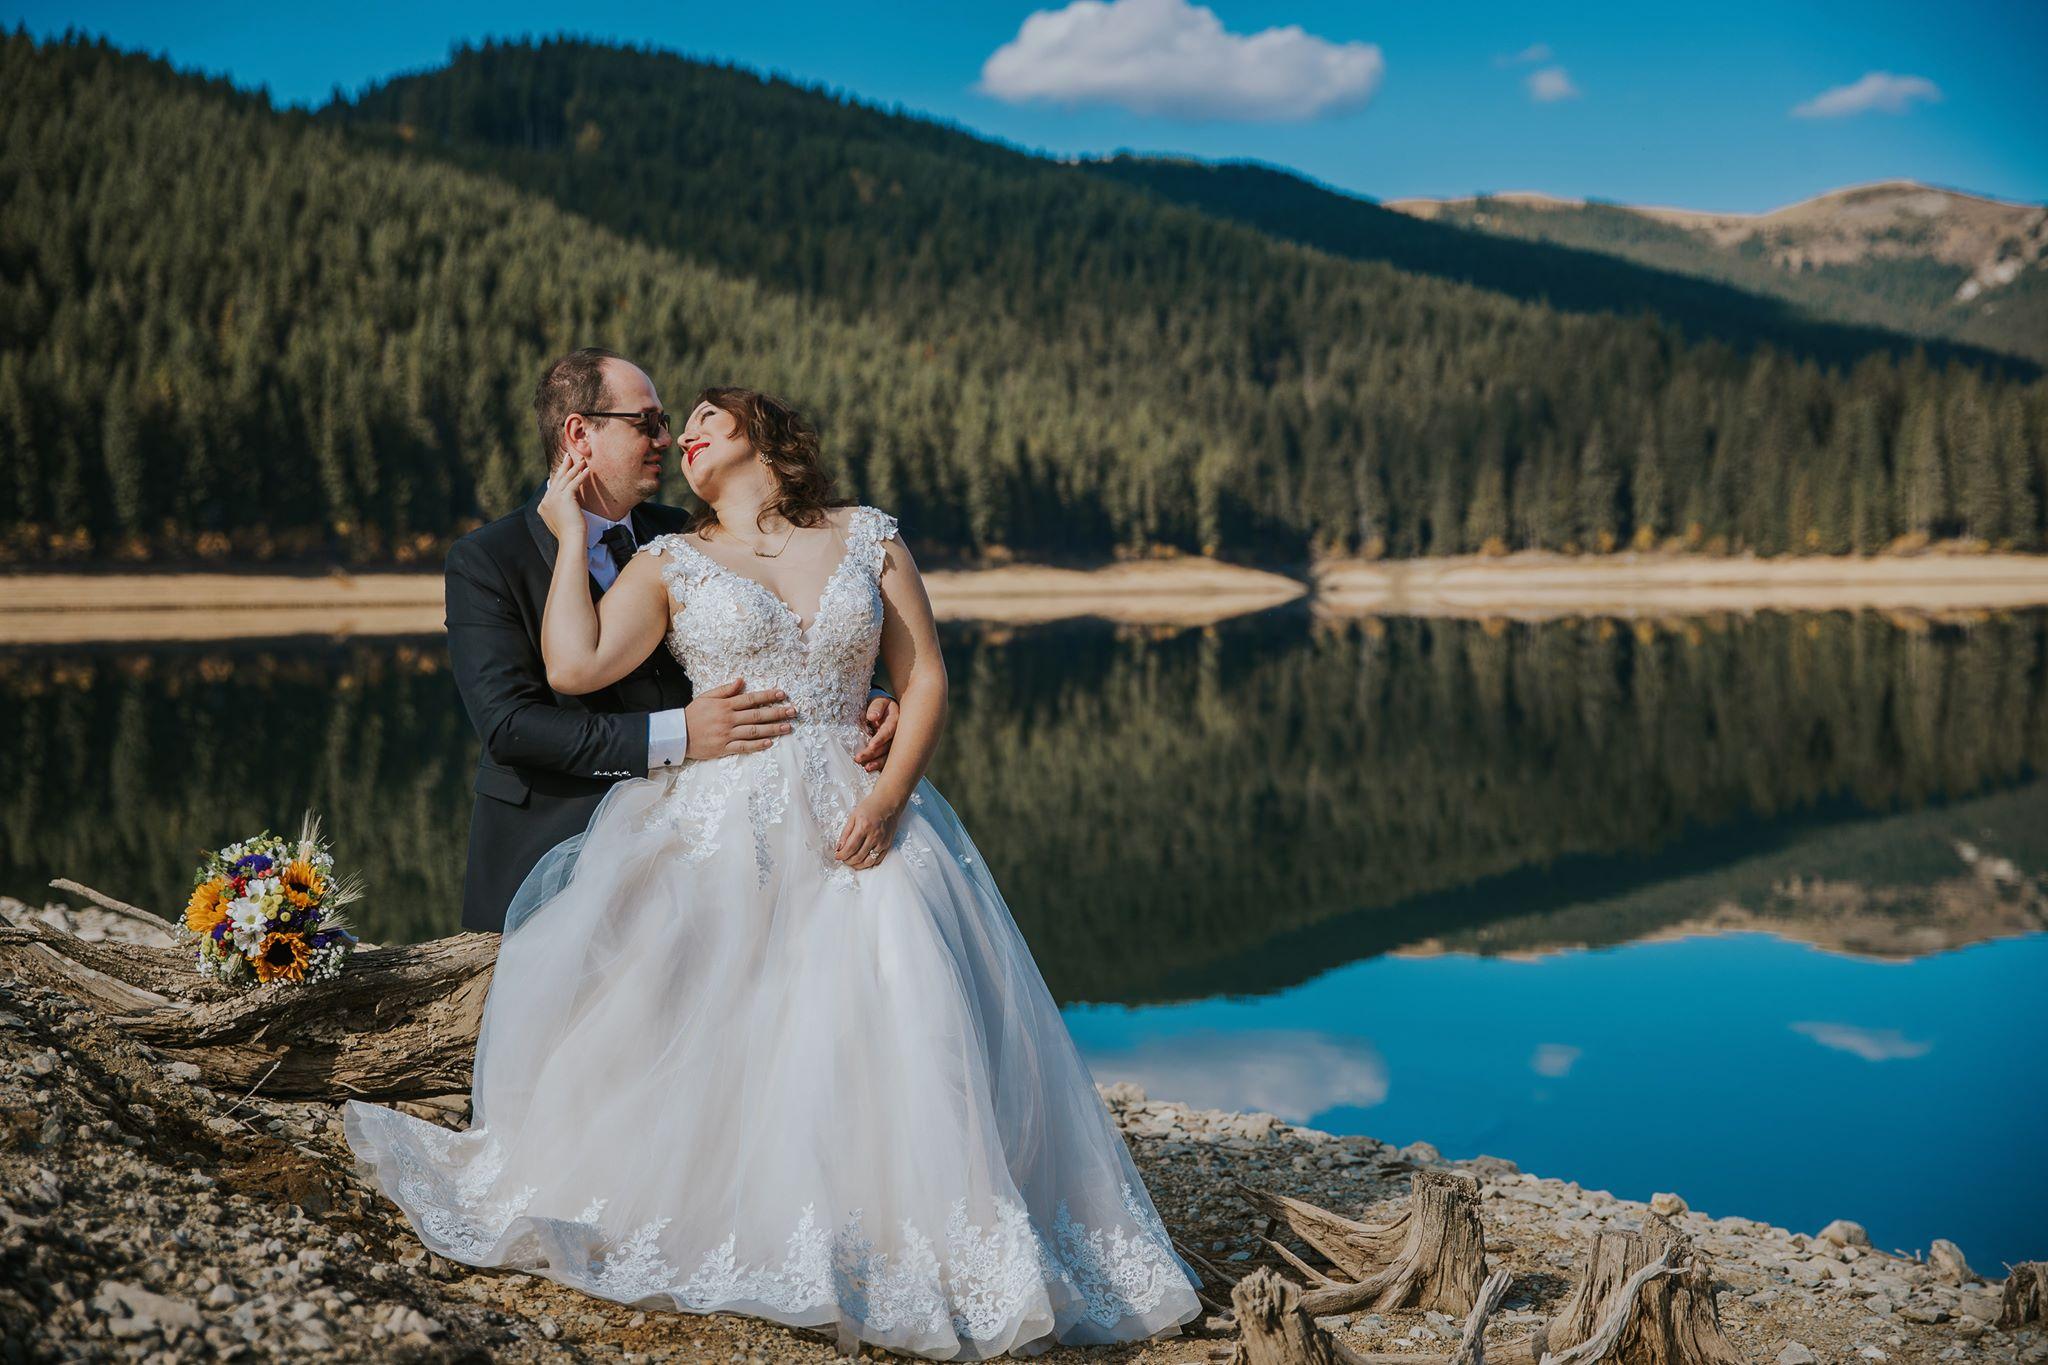 foto video nunta pret